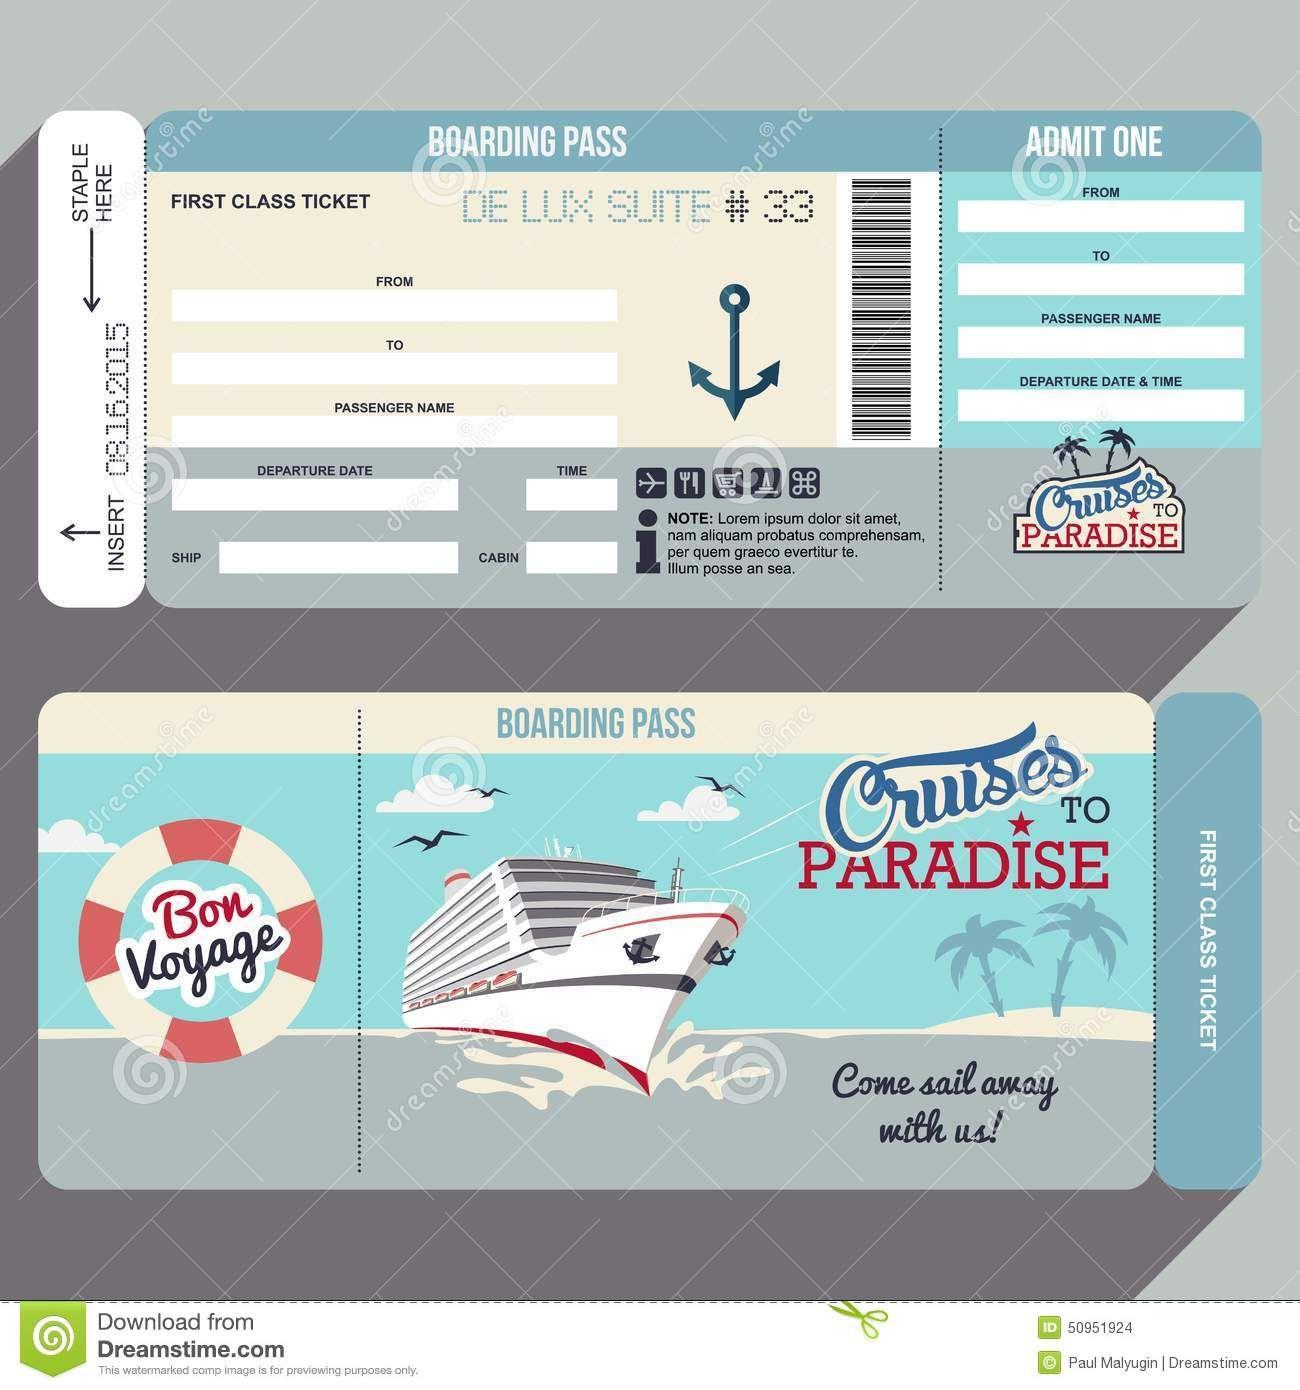 boarding pass template pdf free